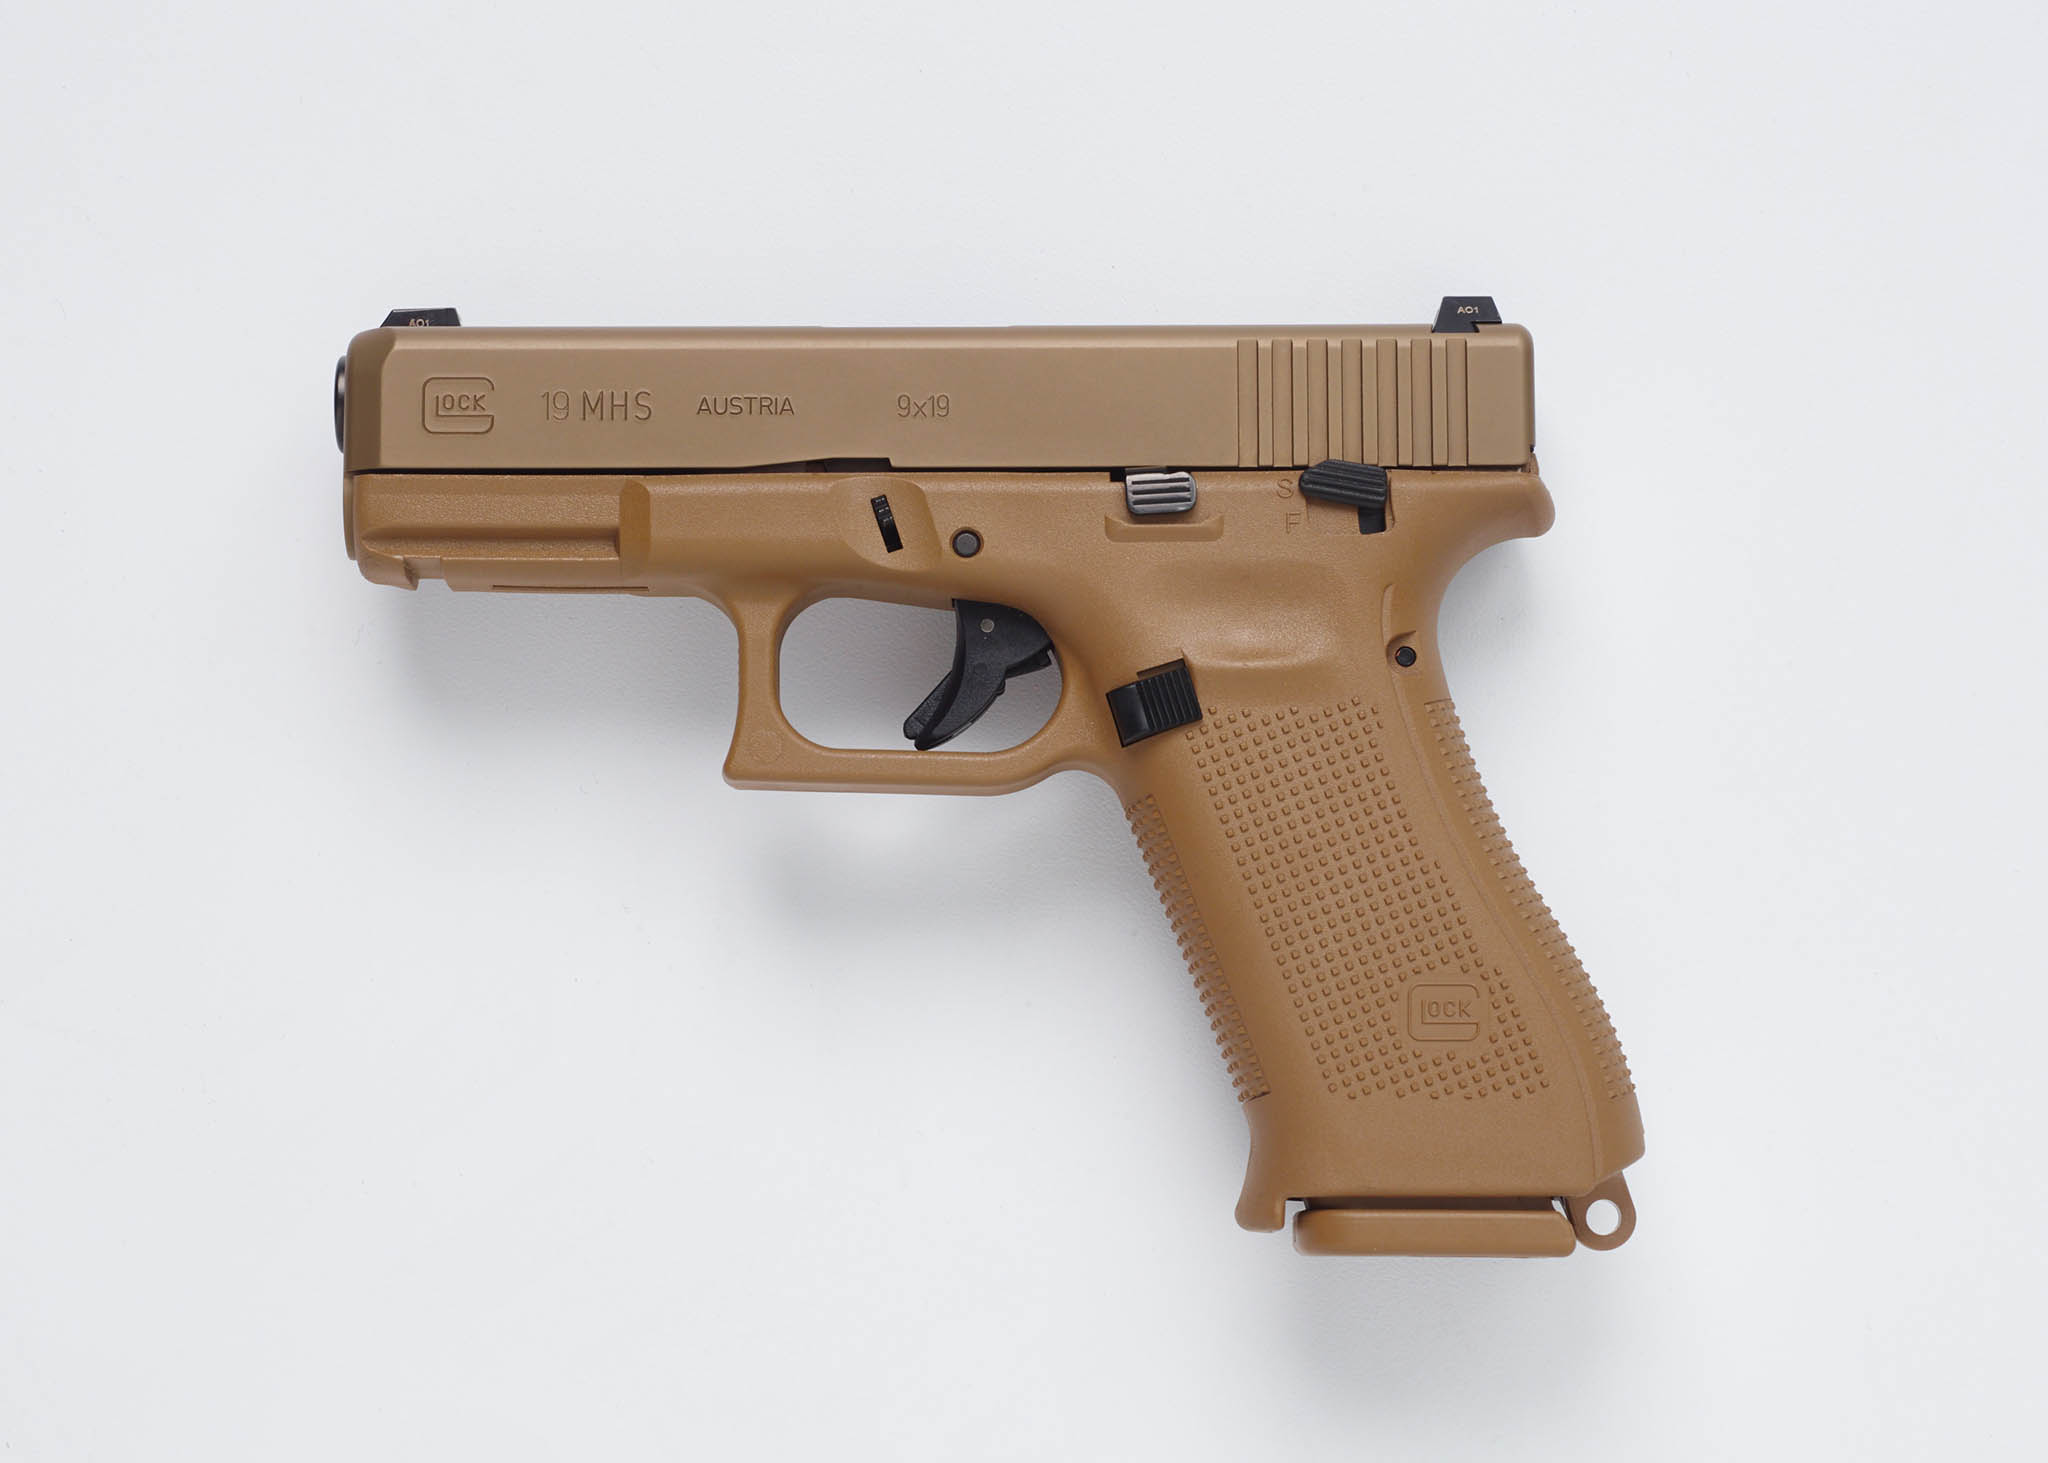 Glock 19 MHS modular handgun system - all4shooters.com